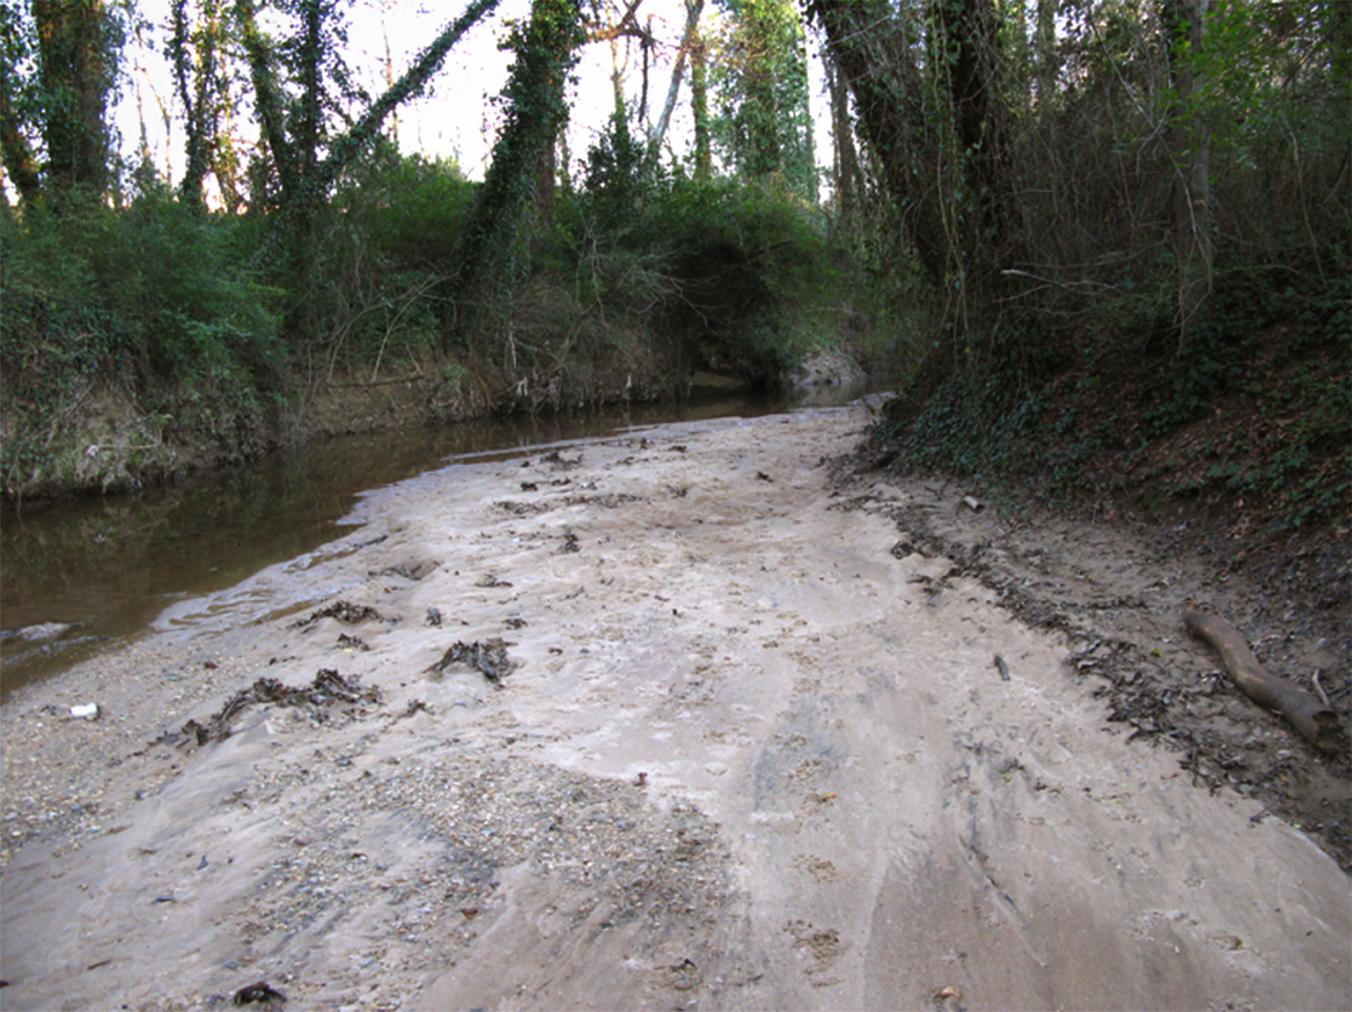 sandbar, randall carlson, geology, hydrology, fluvial depost, creek, channel,